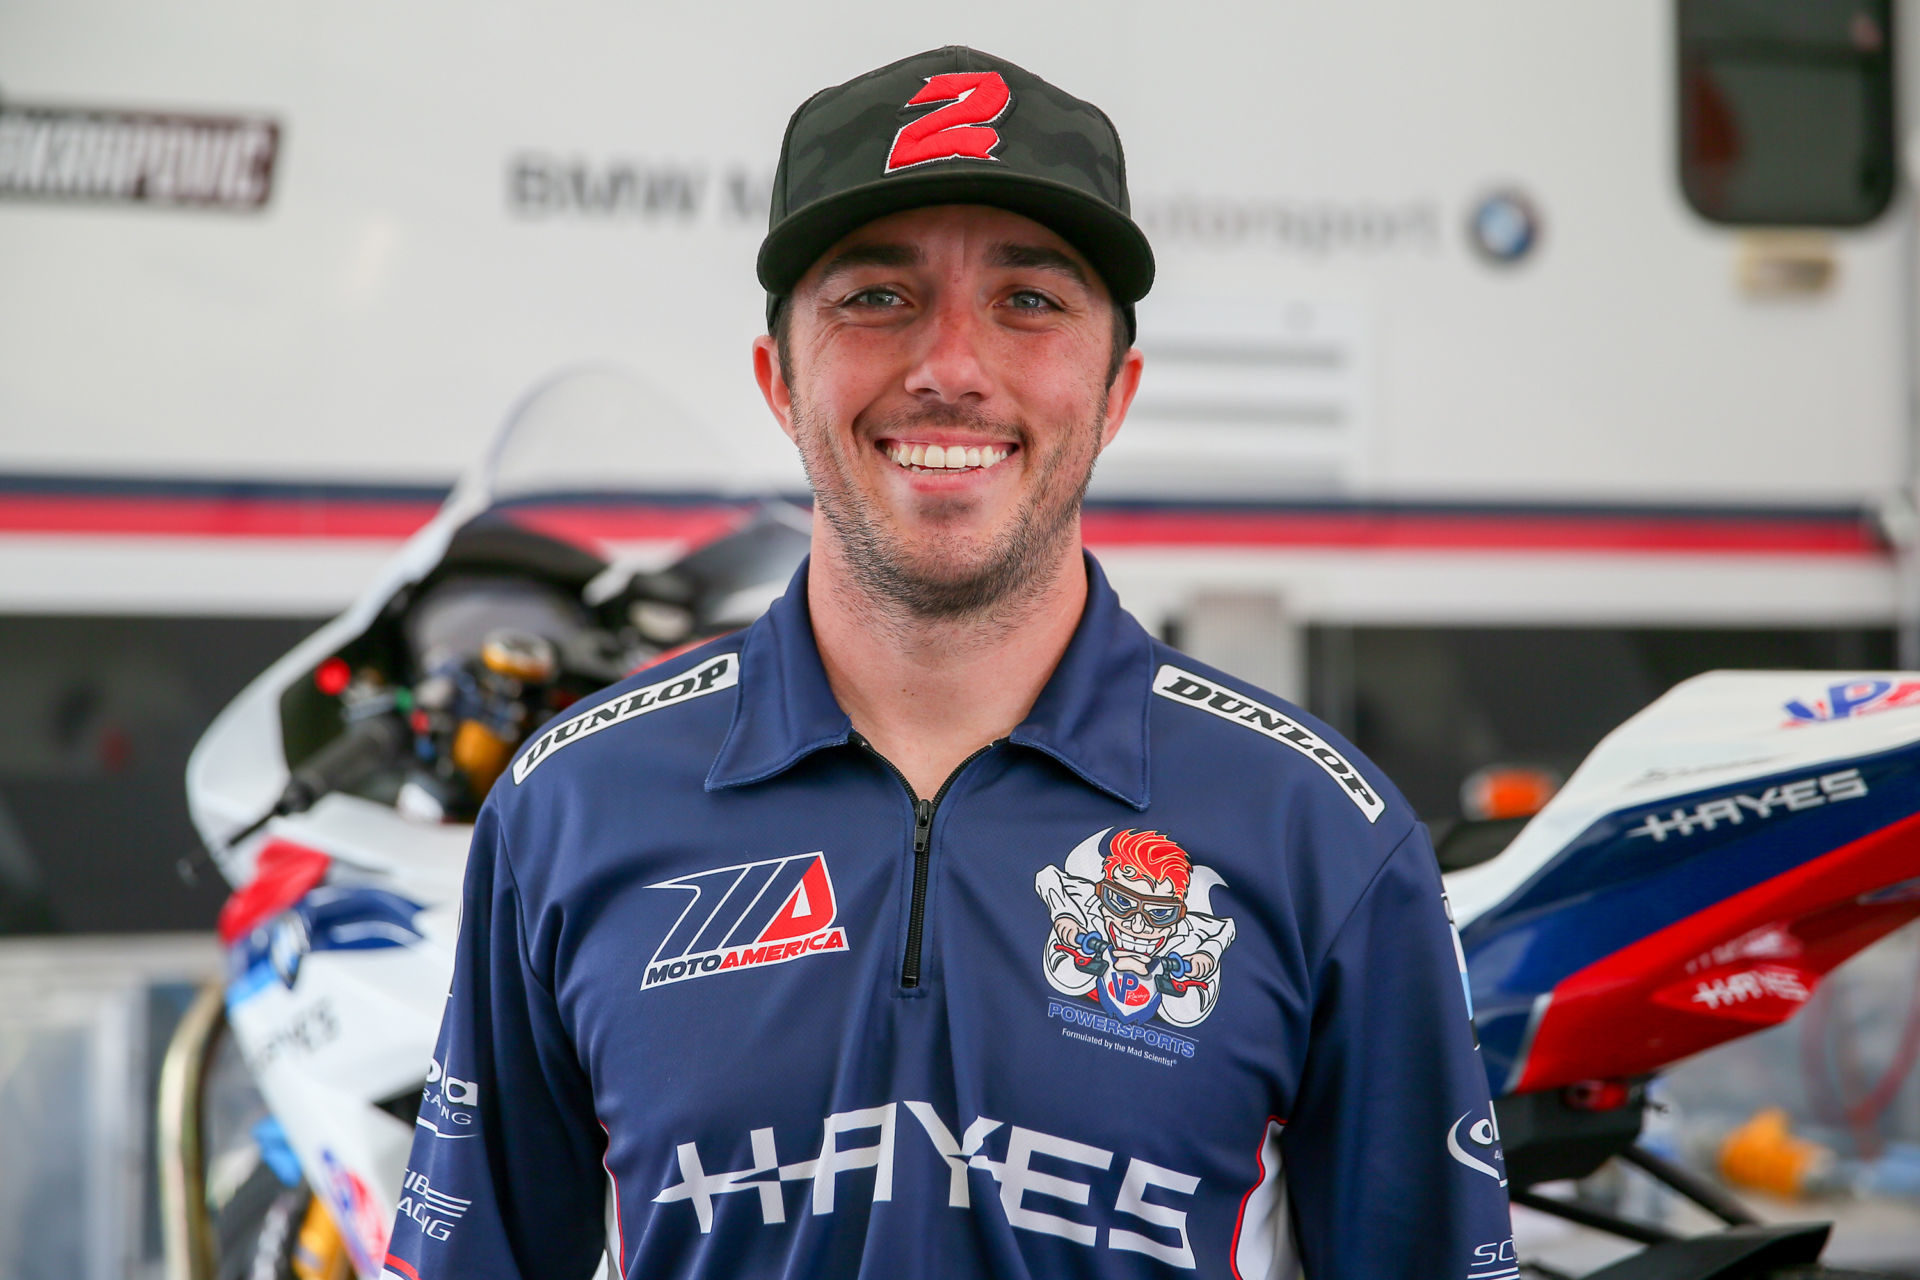 Josh Herrrin. Photo by Jen Muecke, courtesy of Scheibe Racing.